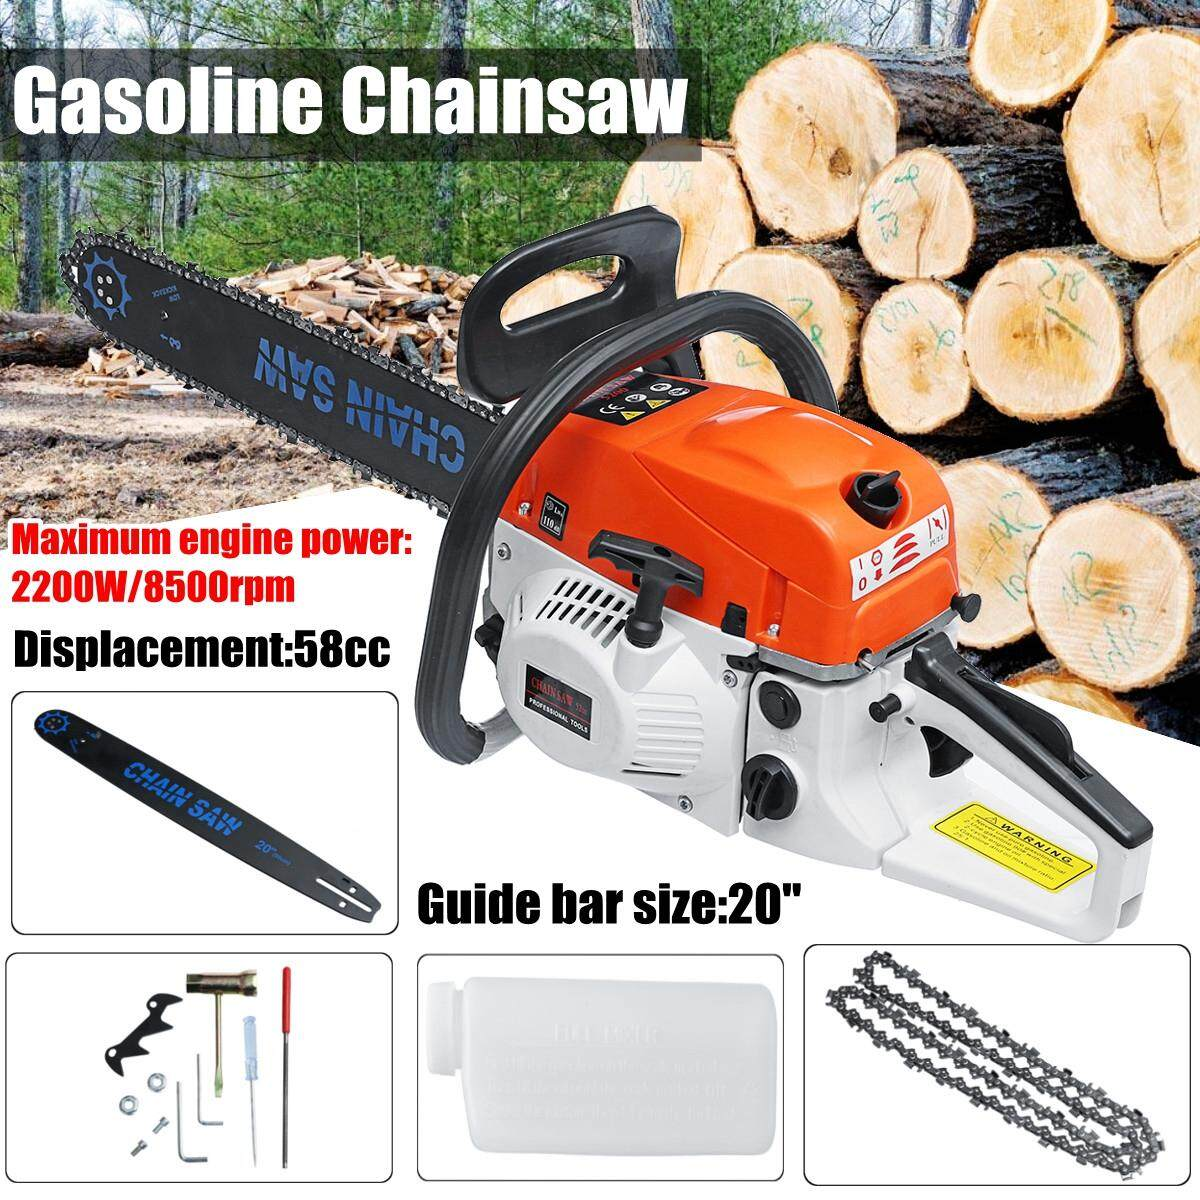 3800w 20 Gasoline Chainsaw Machine Cutting Wood 62cc 12000rmp Gas Chain Saw By Audew.